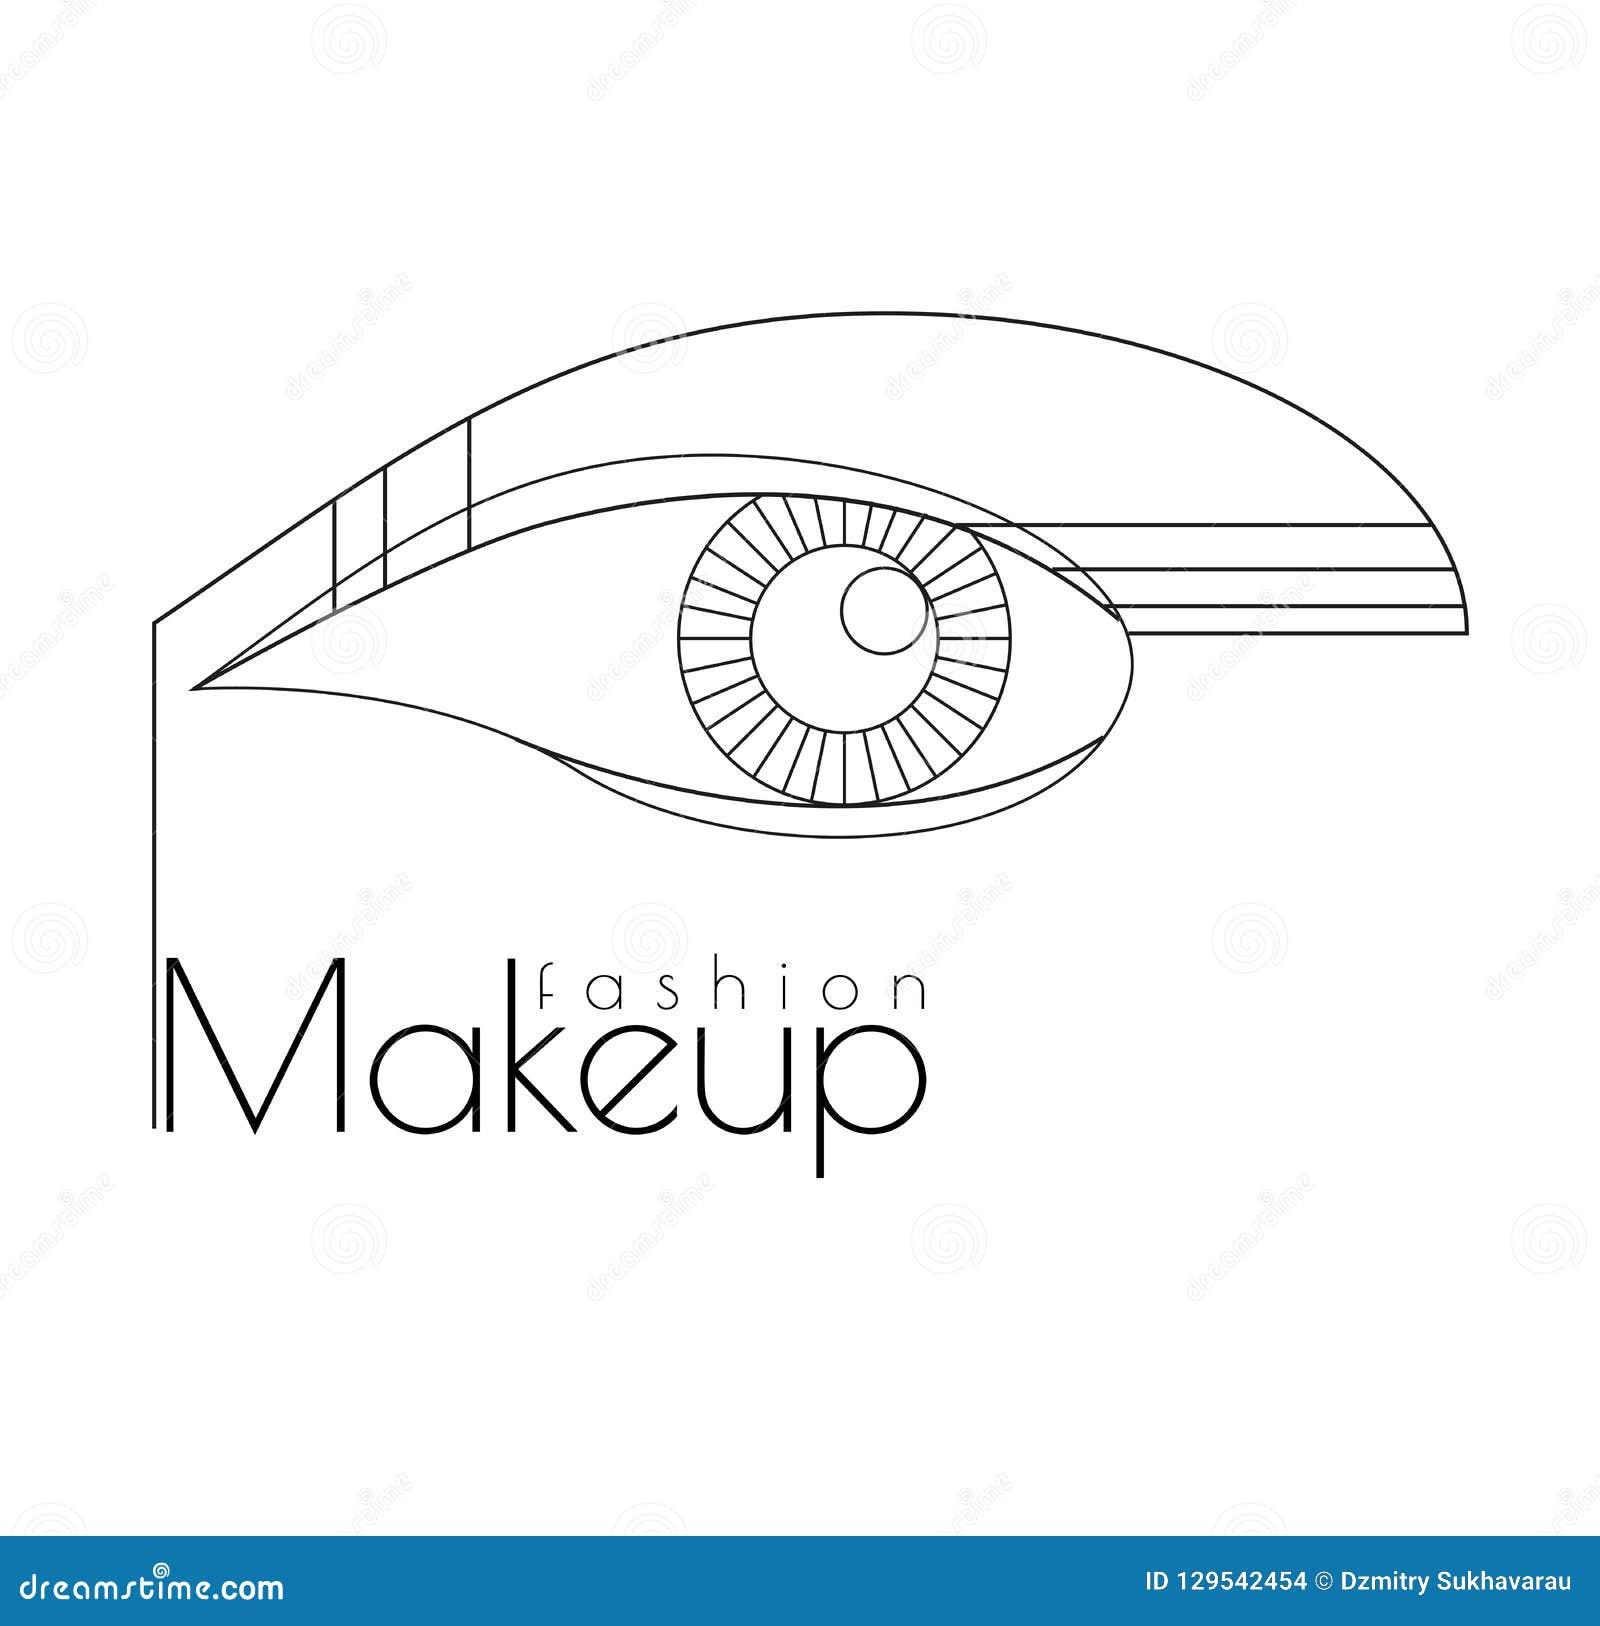 Fashion makeup. Art Deco Illustration. Abstract Line art.